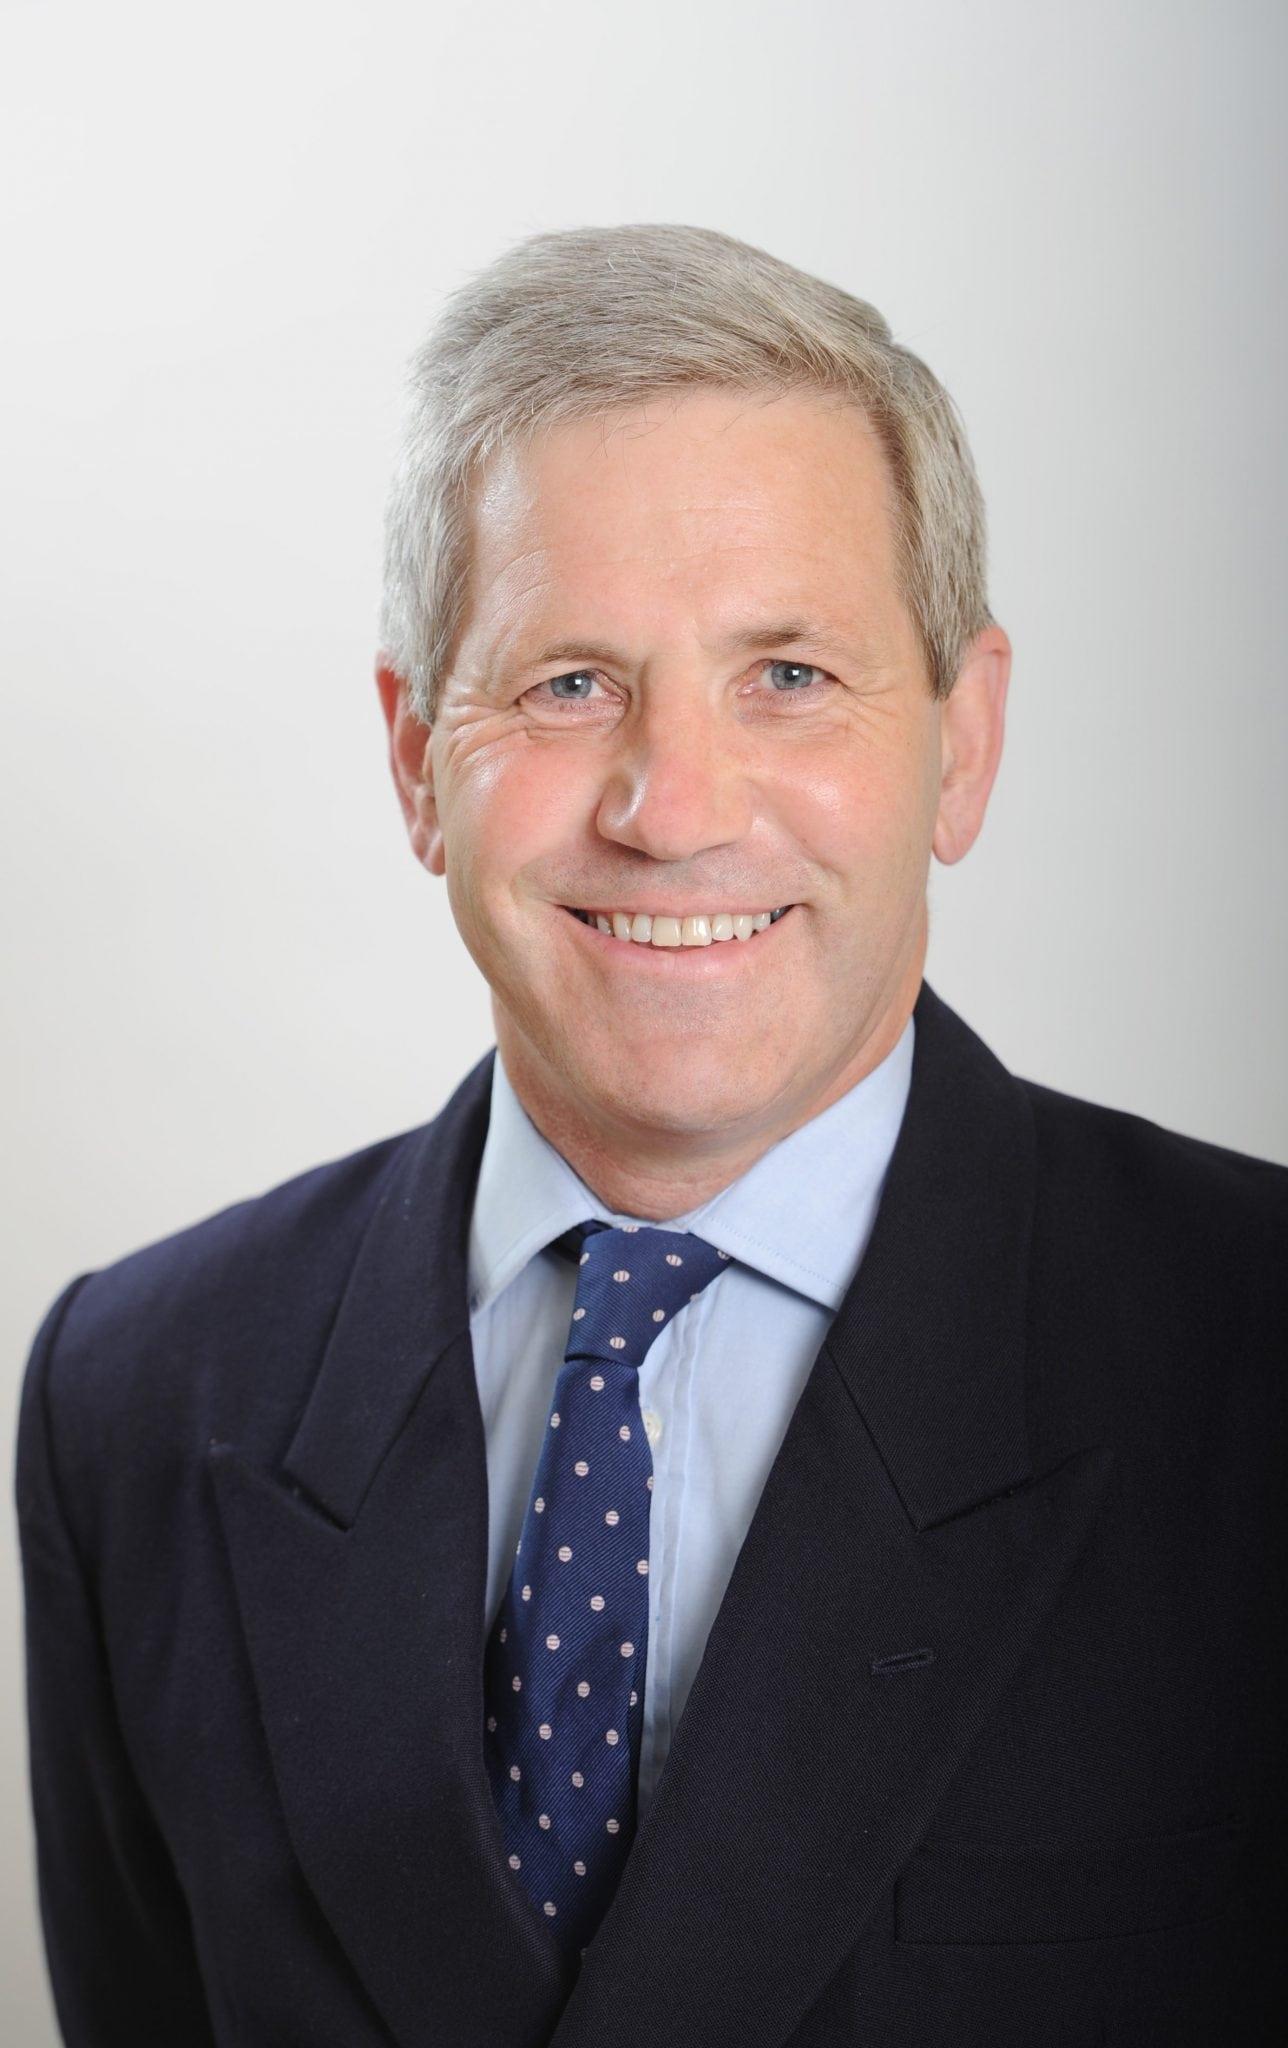 Steve Davies MBE